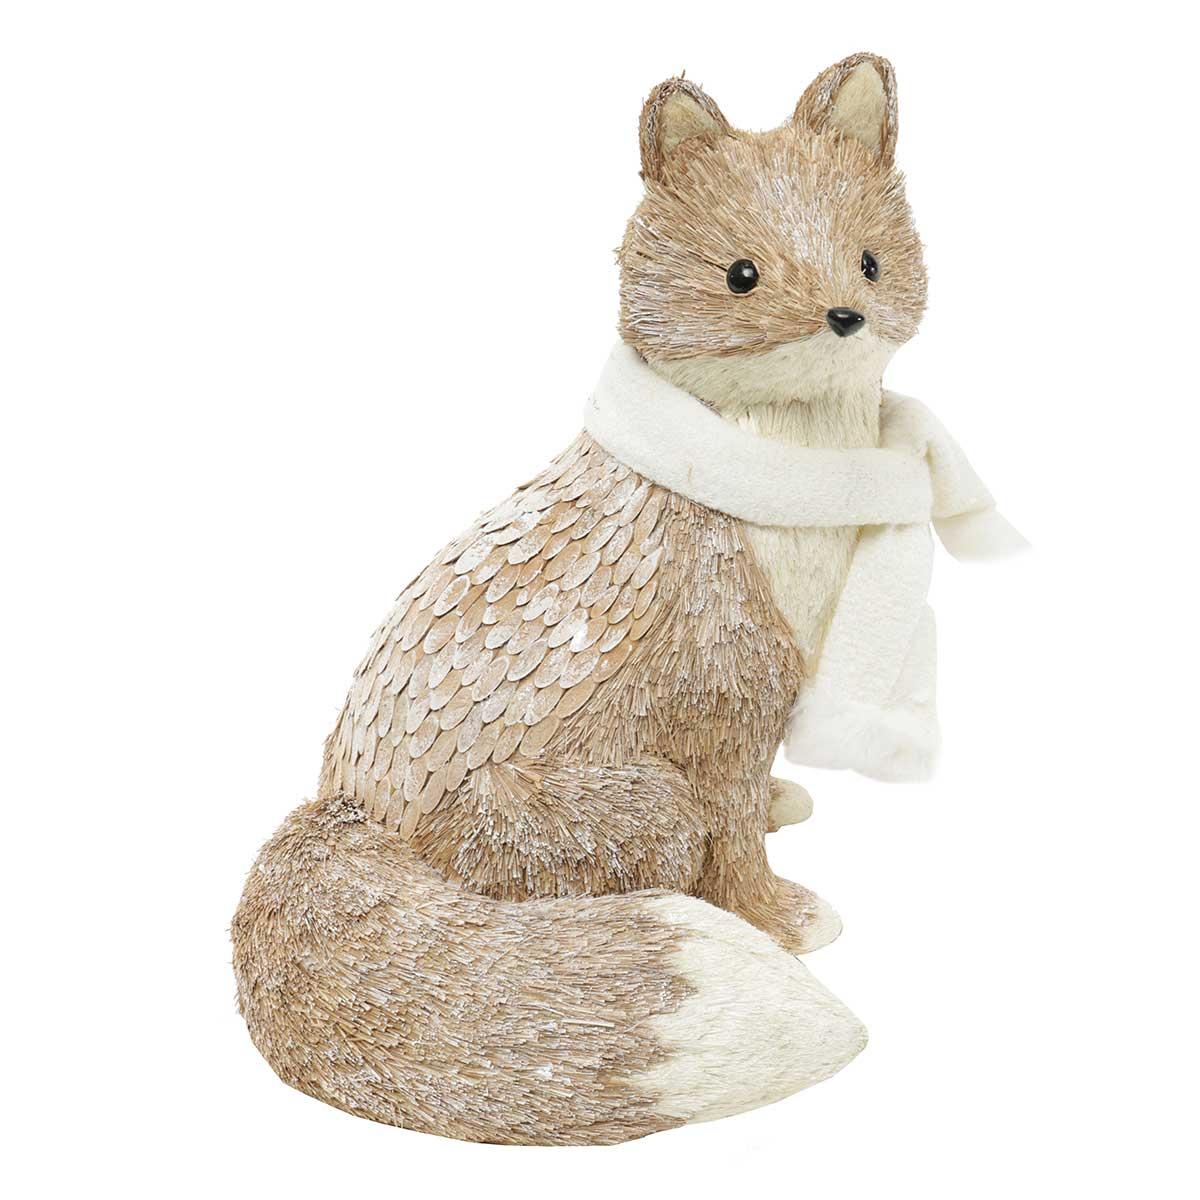 SNOWED INN SITTING SISAL FOX